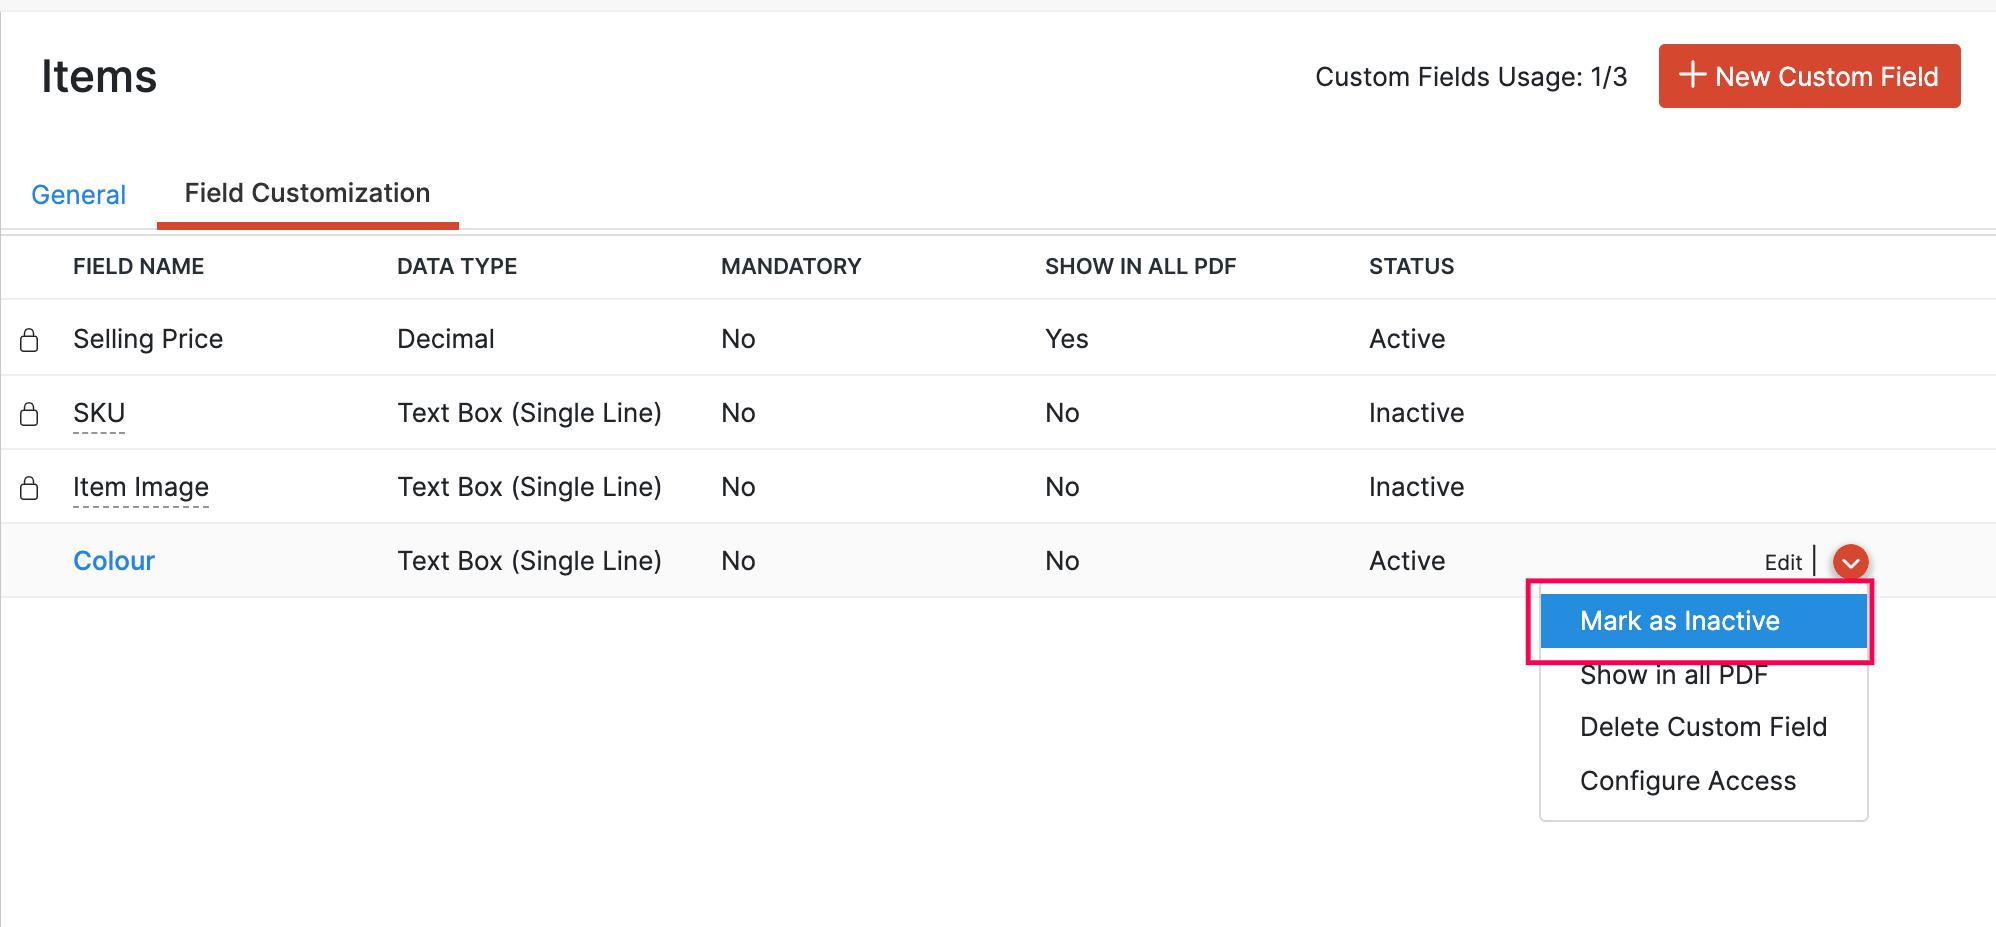 Mark Custom Field as Inactive